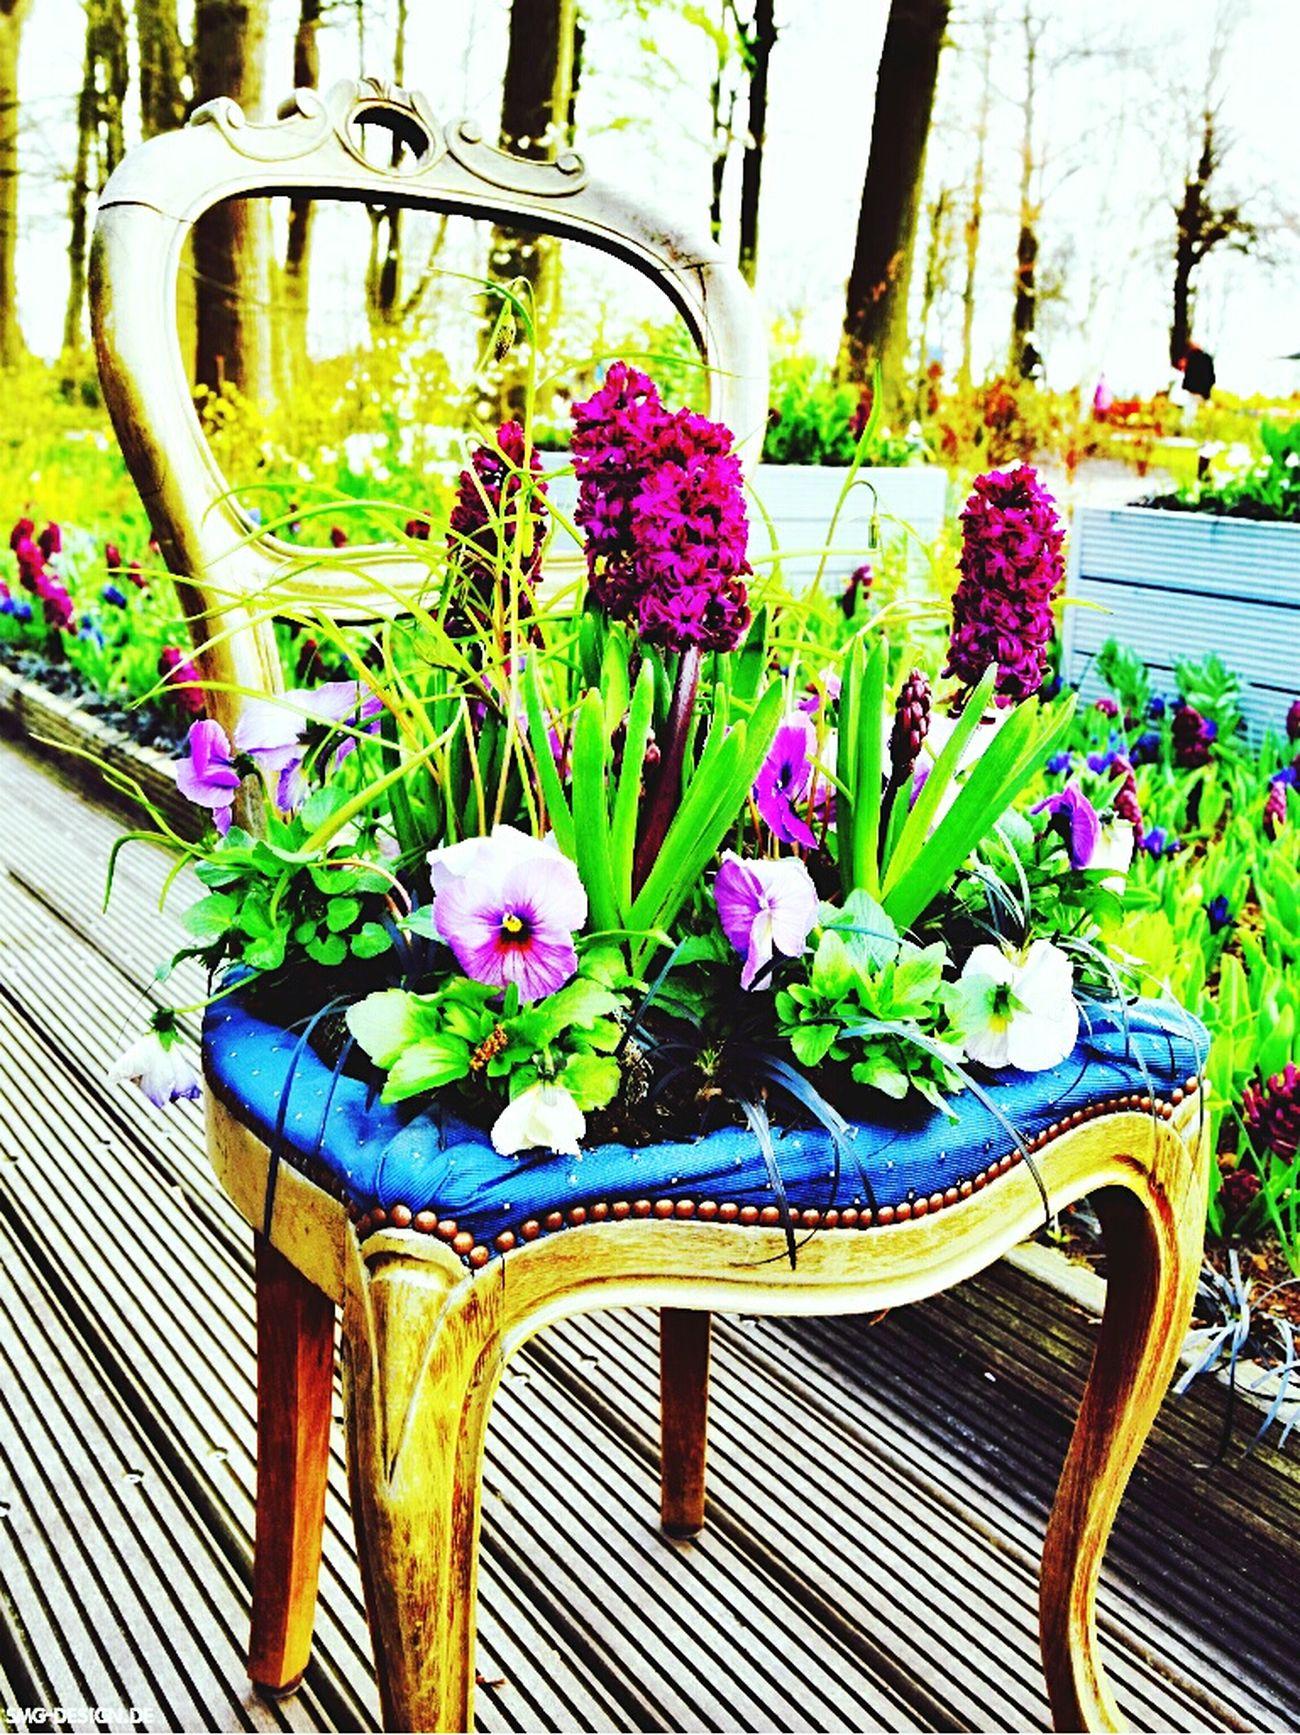 Yeah Springtime! Creative Power EyeEm Best Shots Popular Photos Tadaa Community Flowers Flowers,Plants & Garden To Do List SMG DESIGN EyeEm Gallery